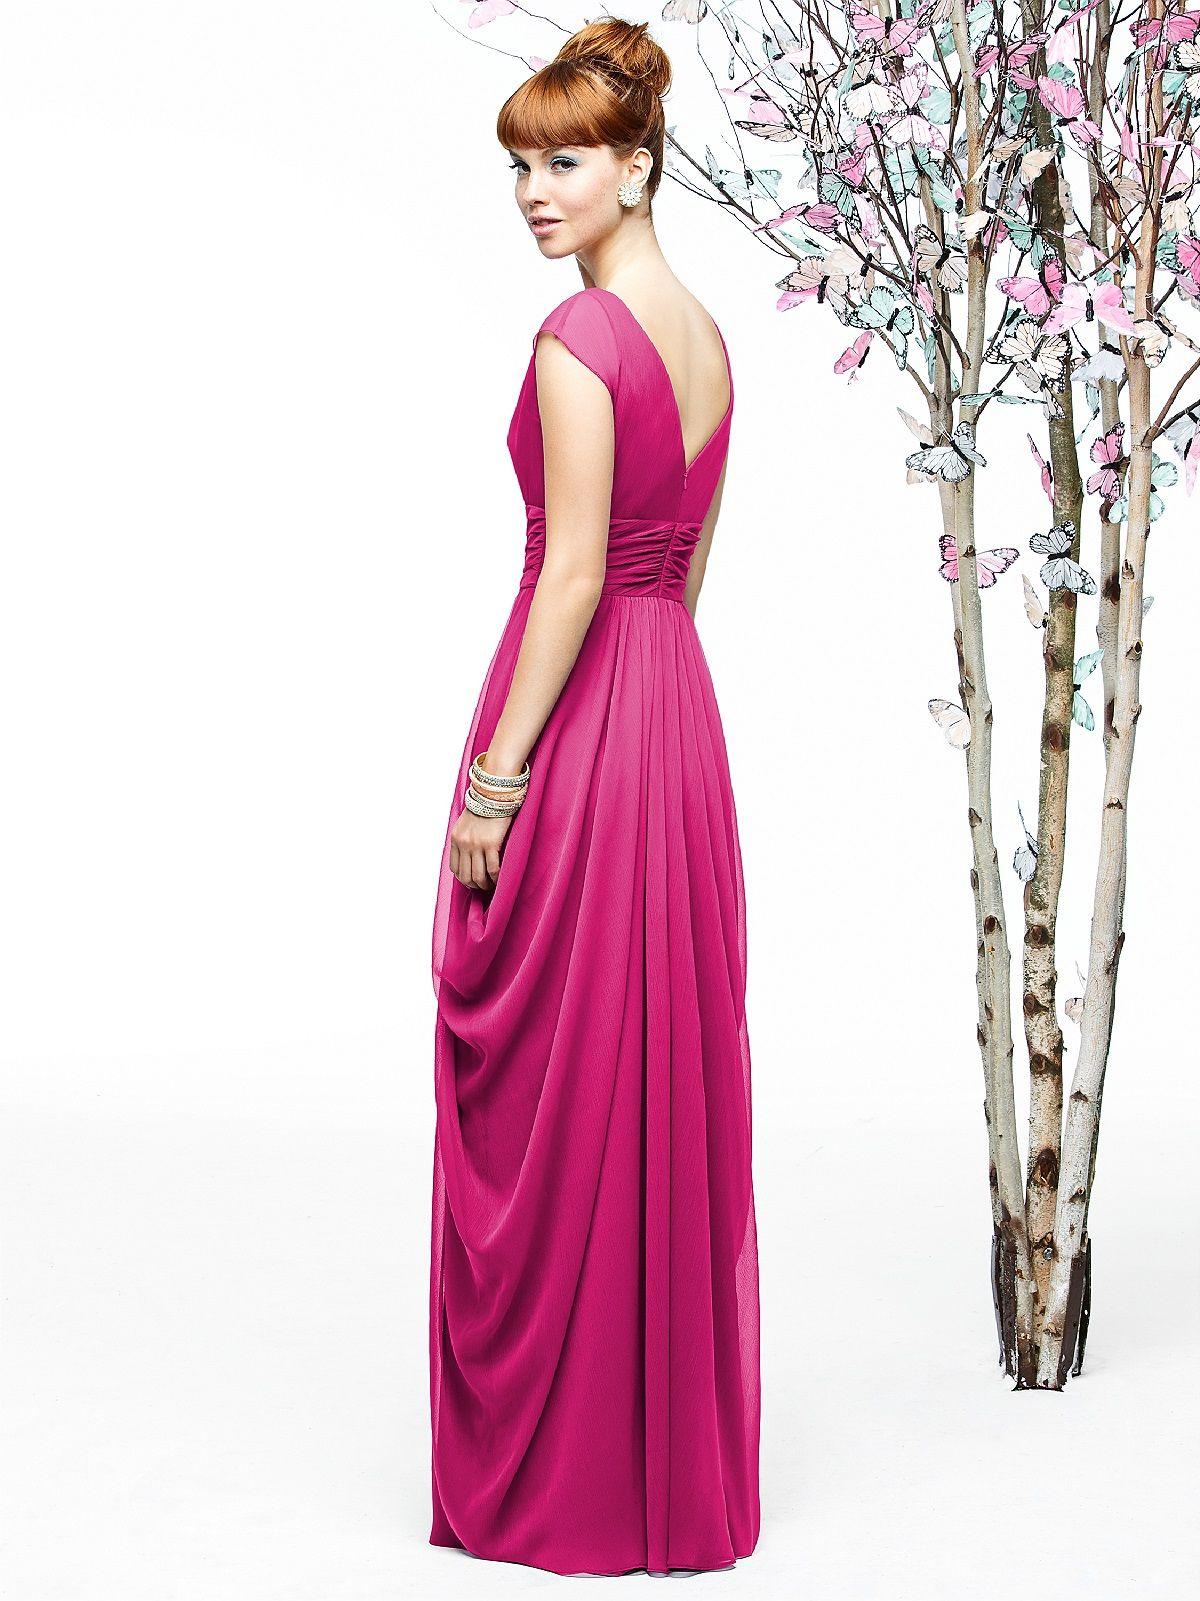 Lela Rose Style LR200 | Pinterest